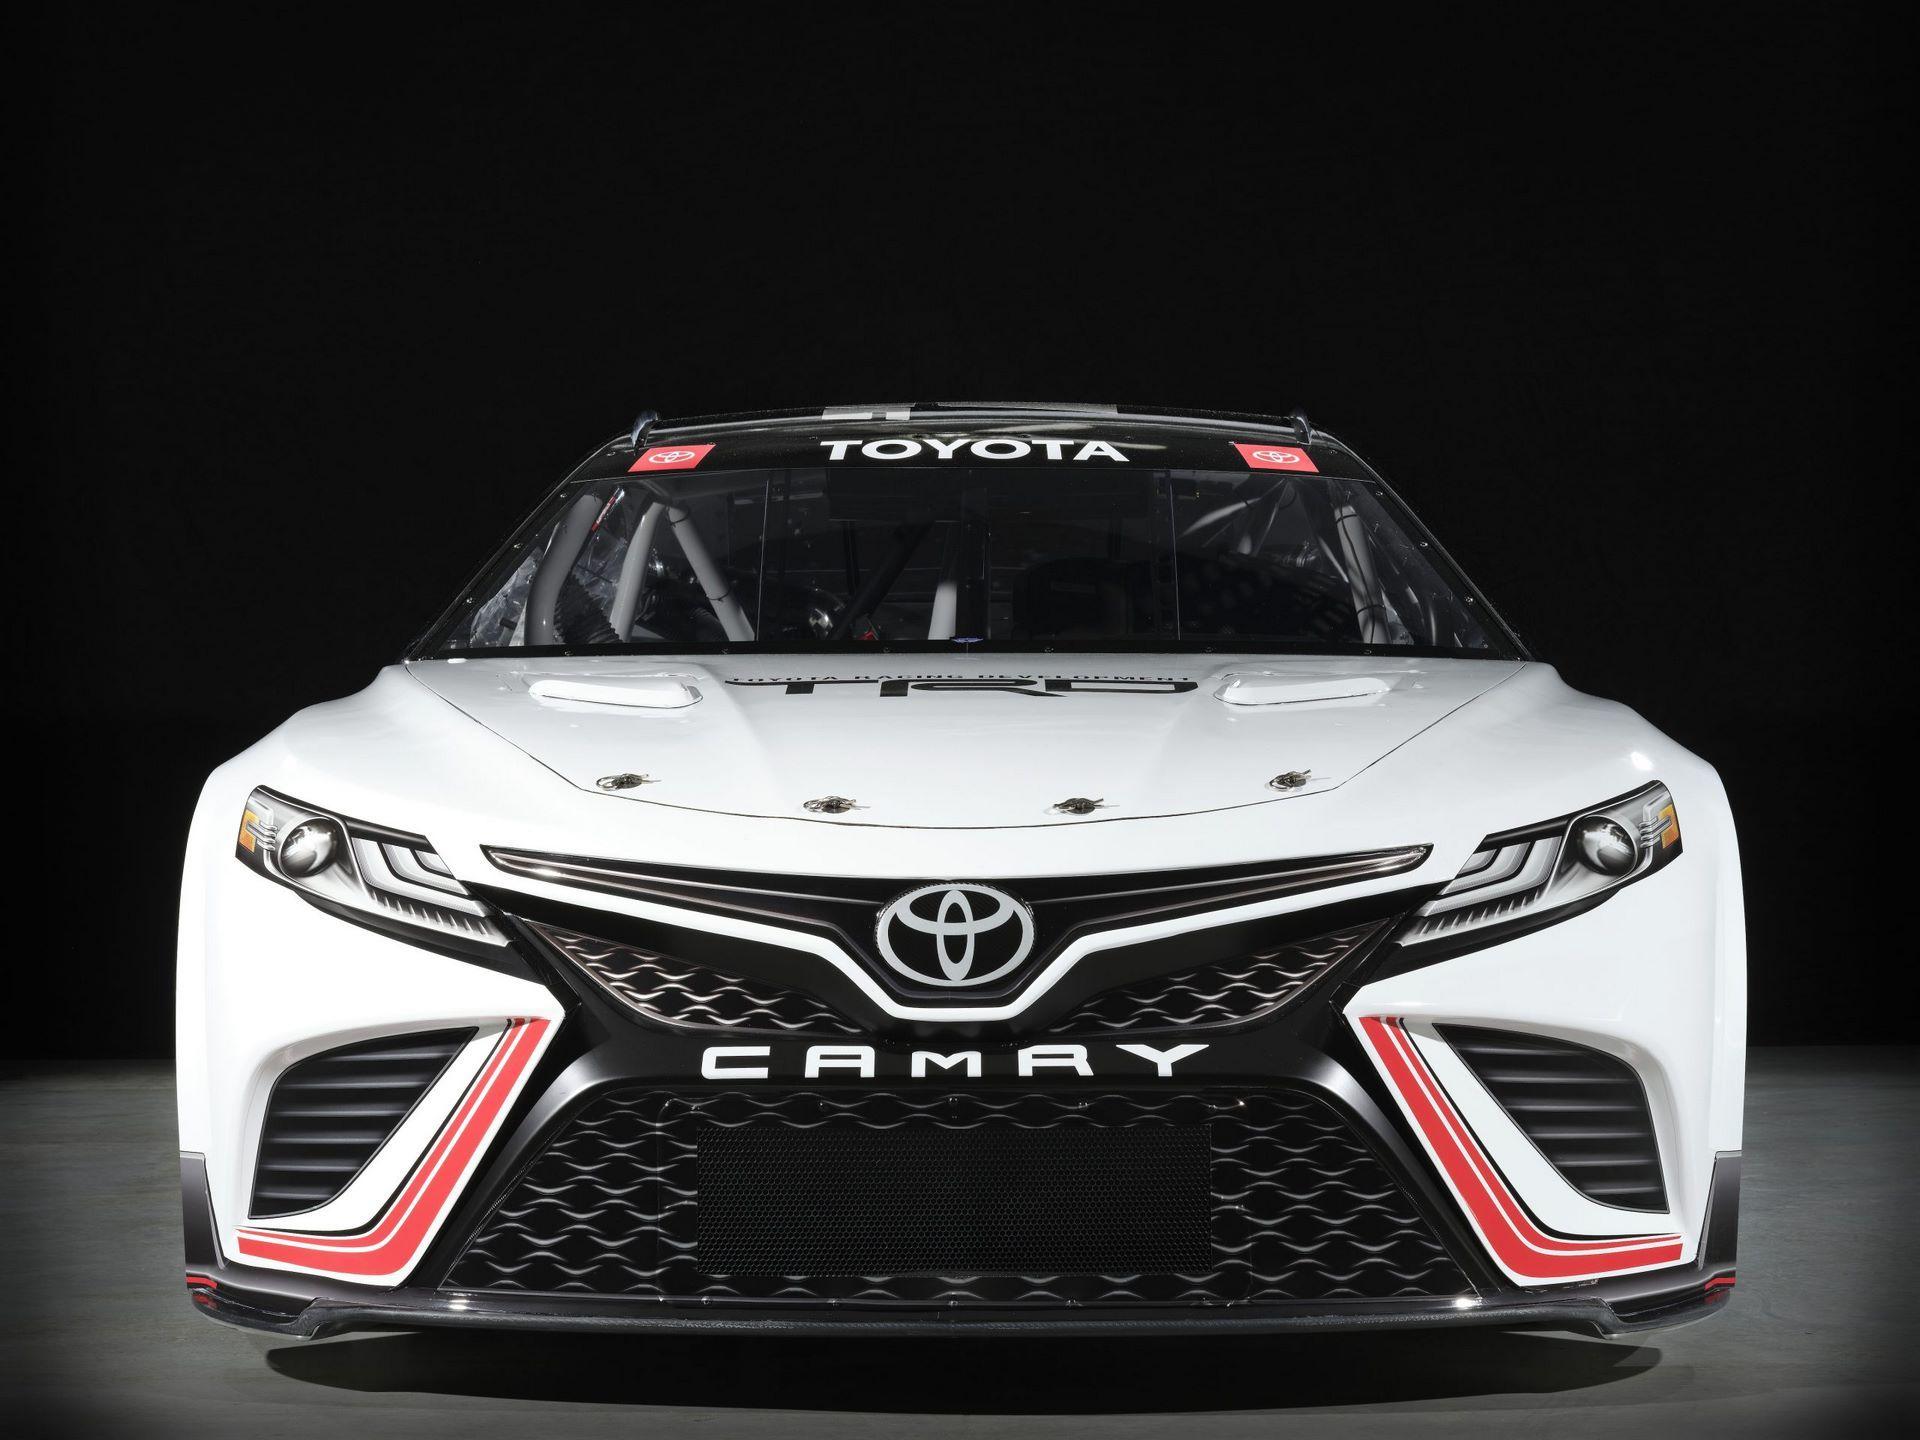 Toyota-TRD-Camry-Next-Gen-Nascar-5